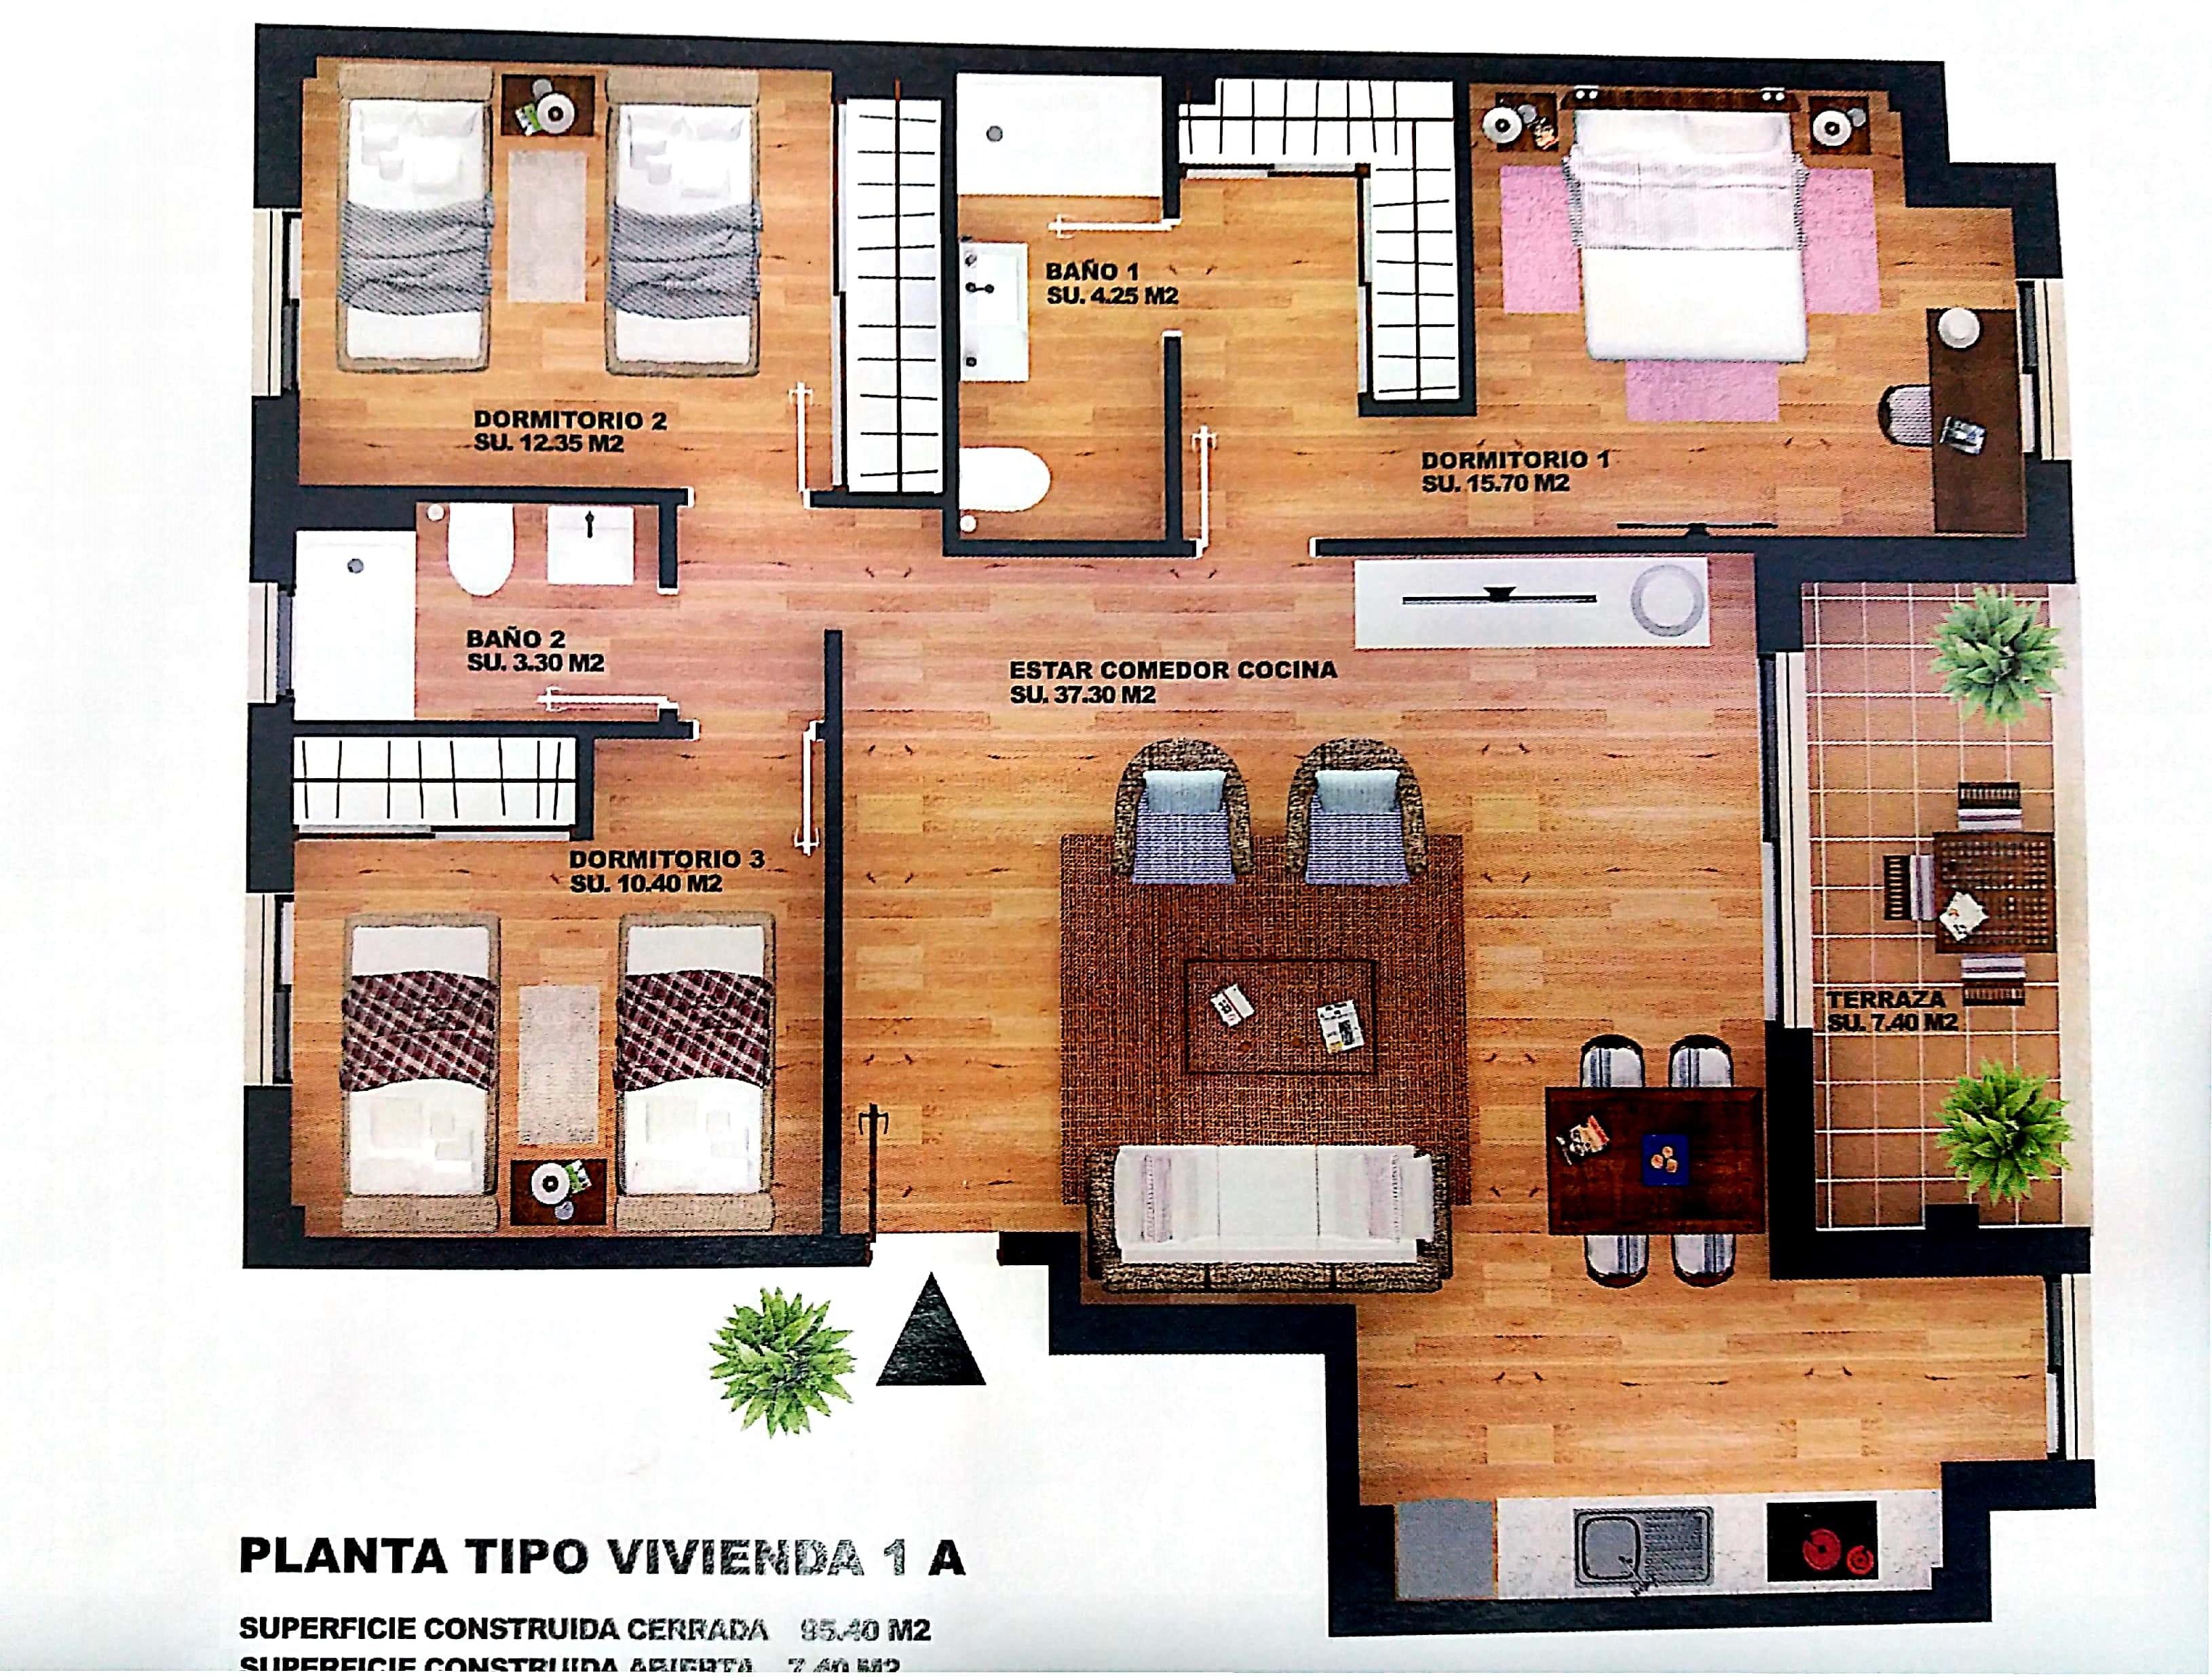 1876 mc pisos obra nueva en archiduque lluis salvador palma de mallorca inmobiliaria pe as - Obra nueva en palma de mallorca ...